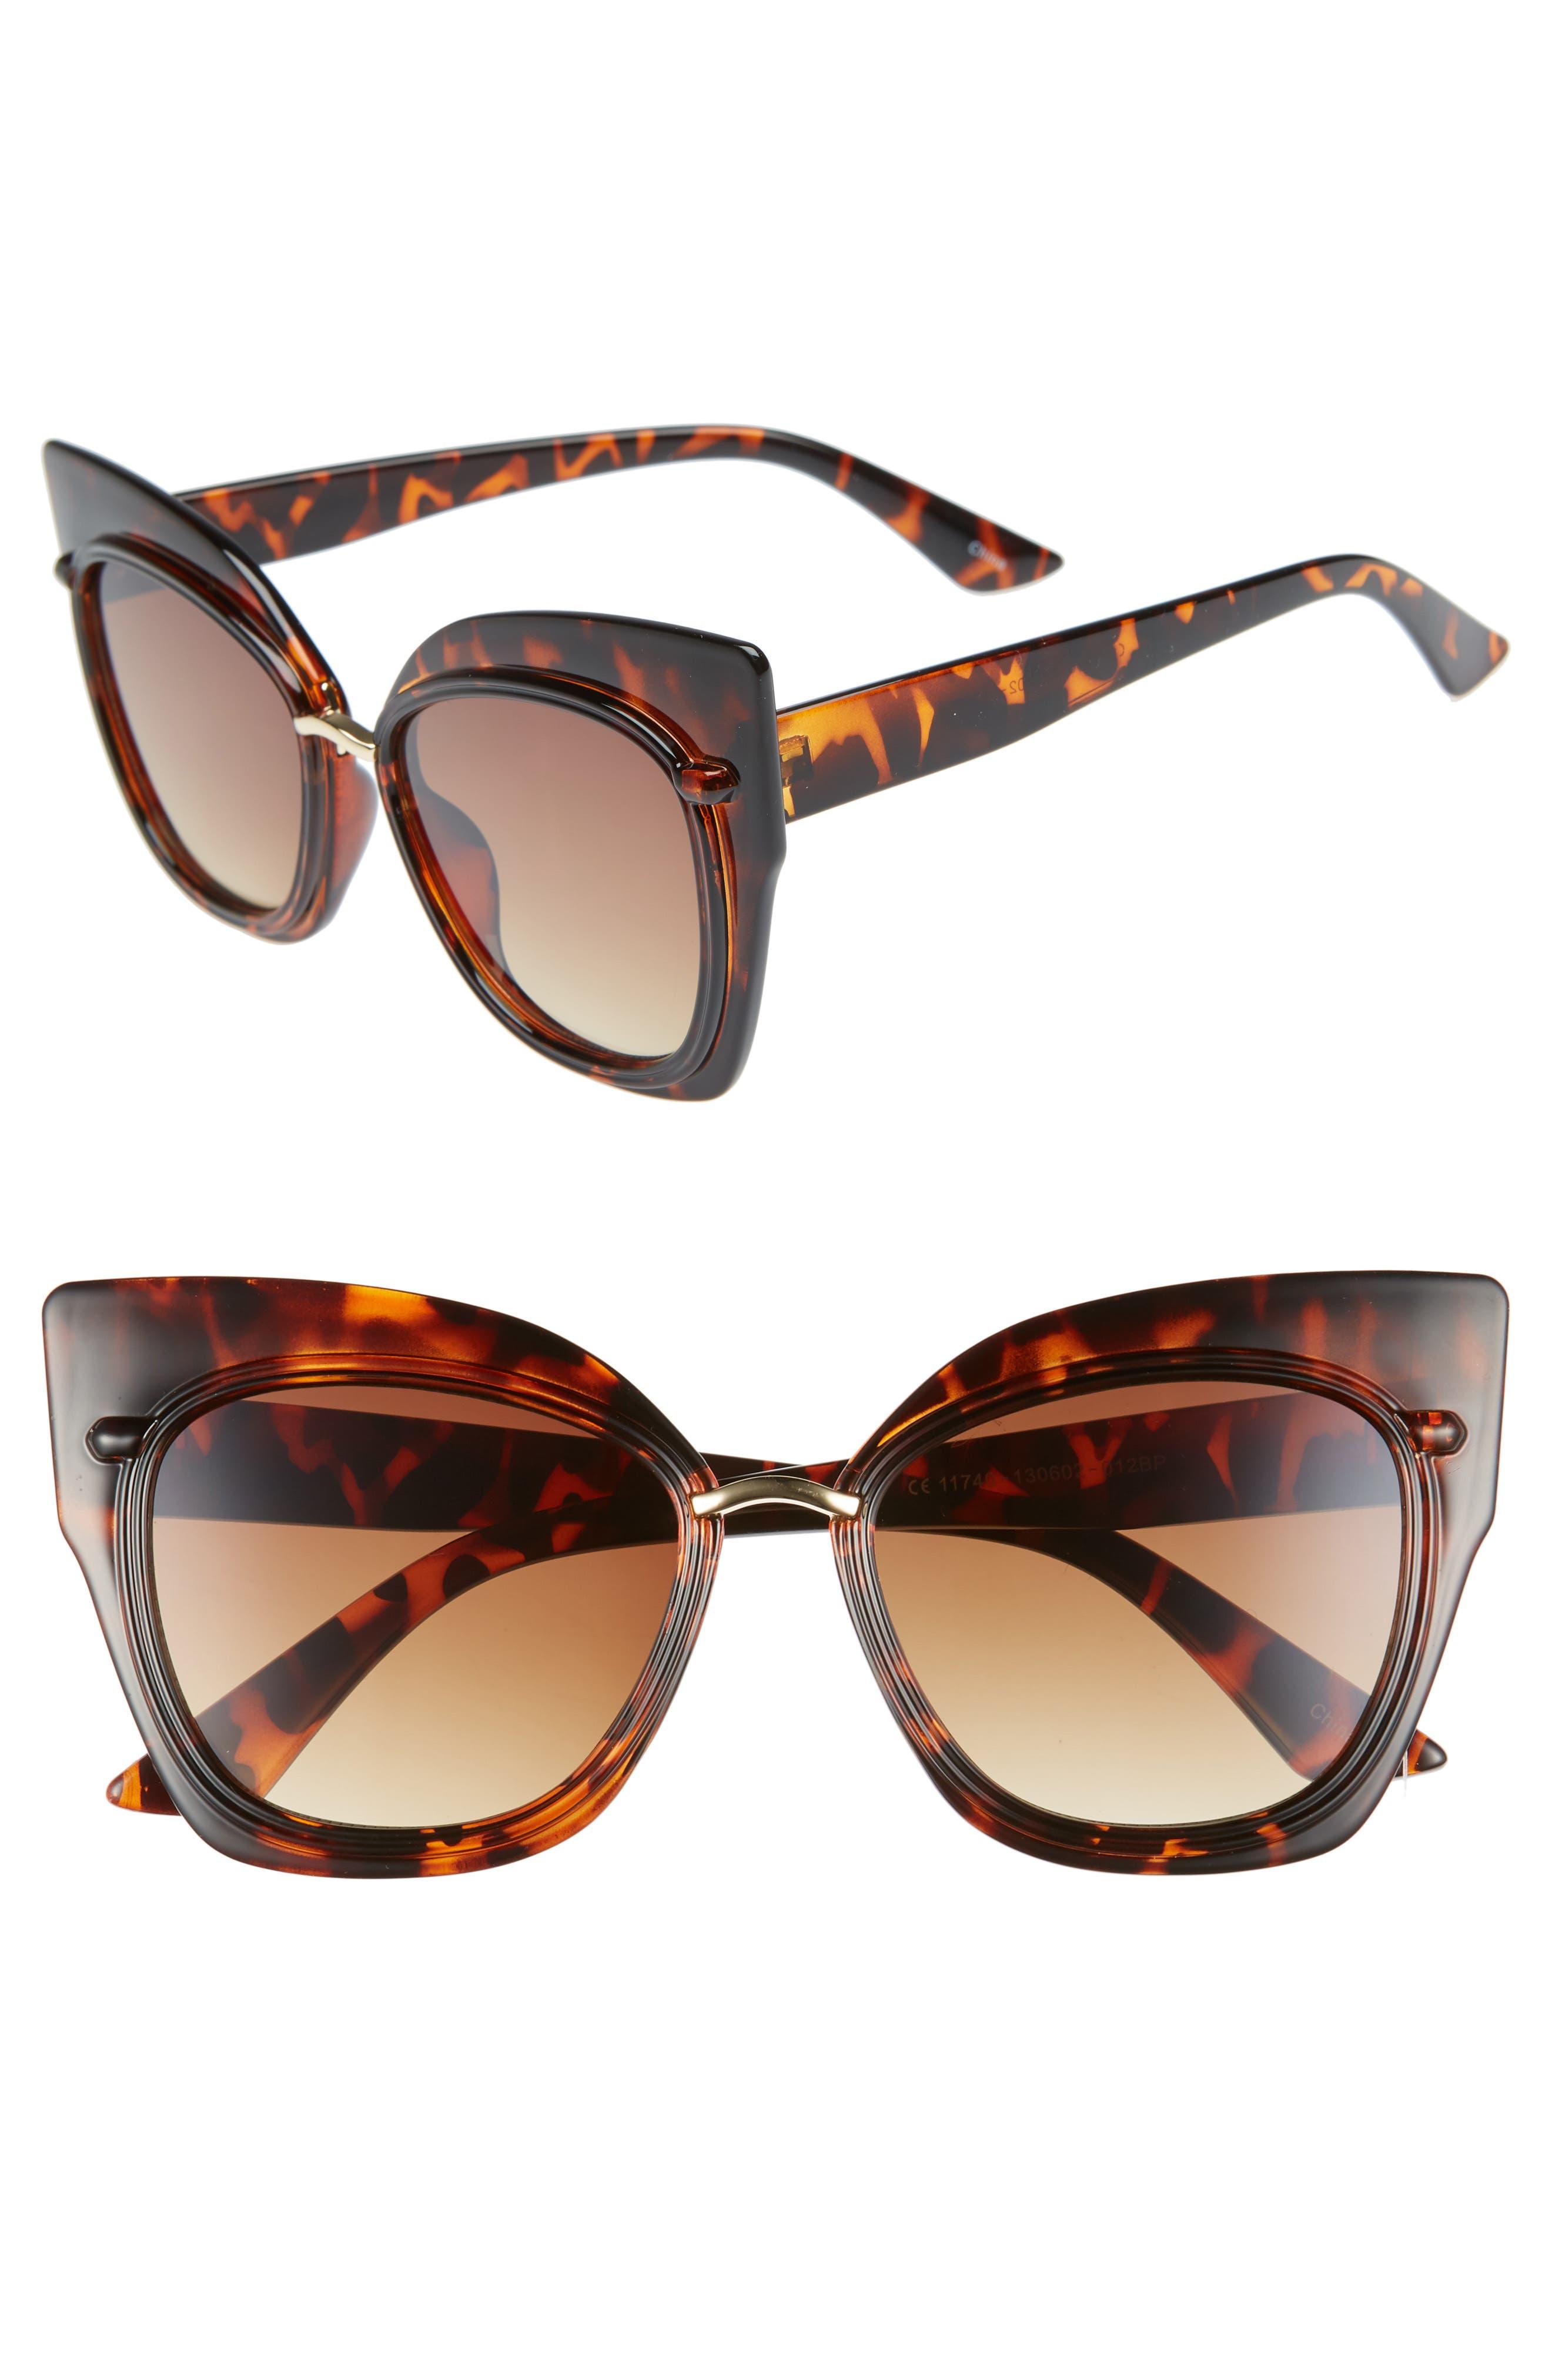 55mm Dual Oversized Cat Eye Sunglasses,                         Main,                         color, 200